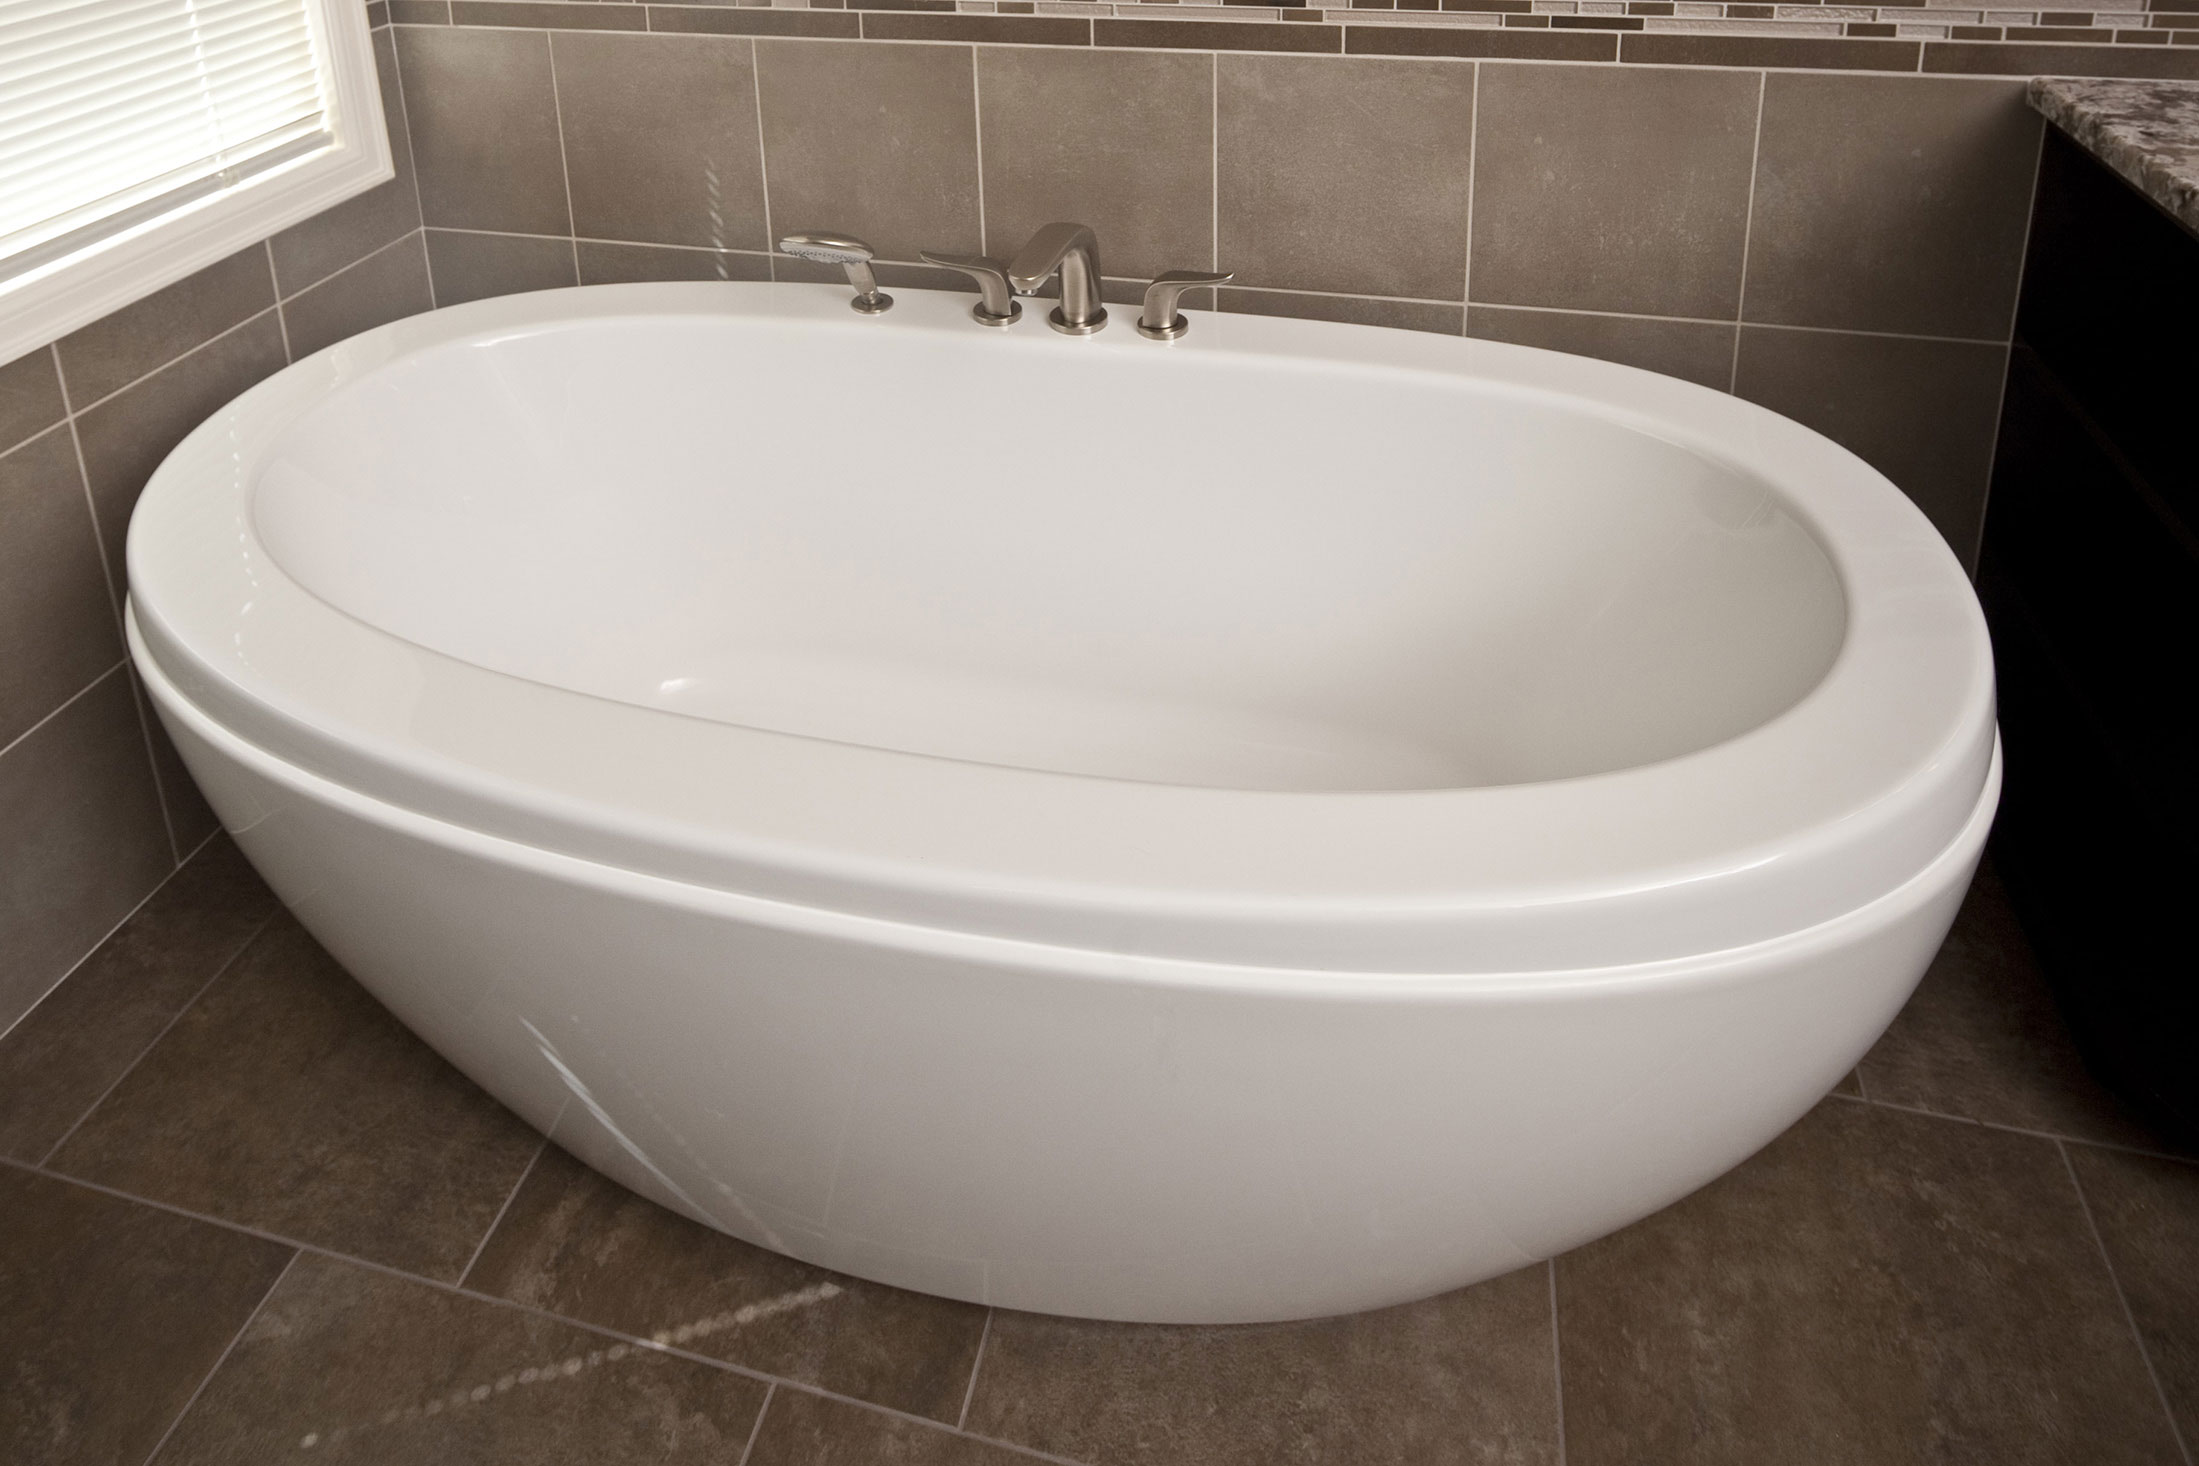 freestanding-tub-min